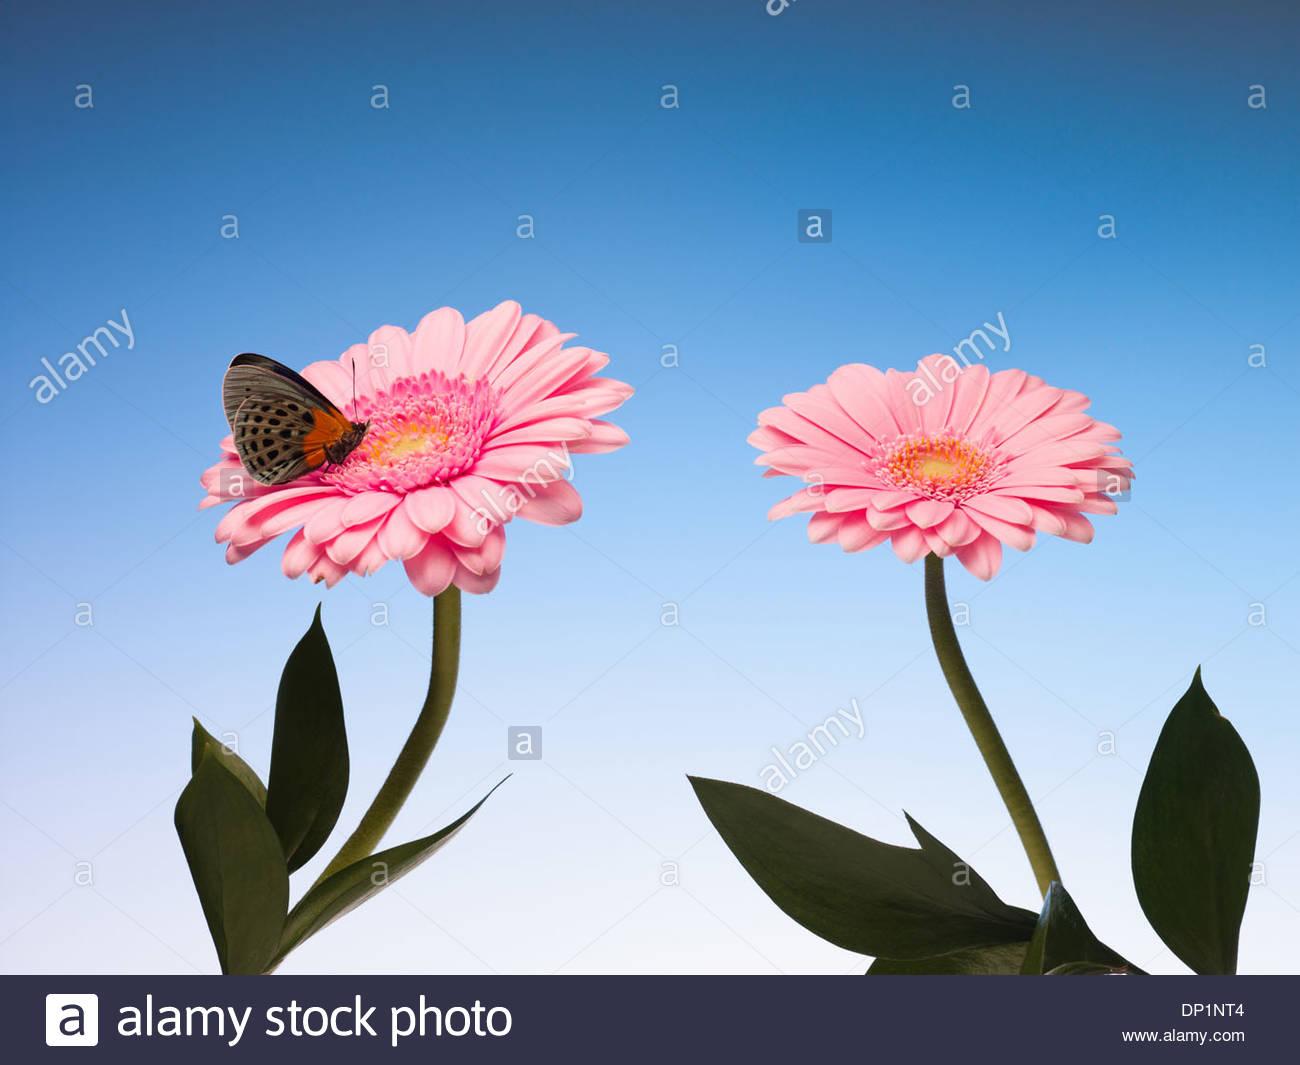 Two pink gerbera daisies - Stock Image